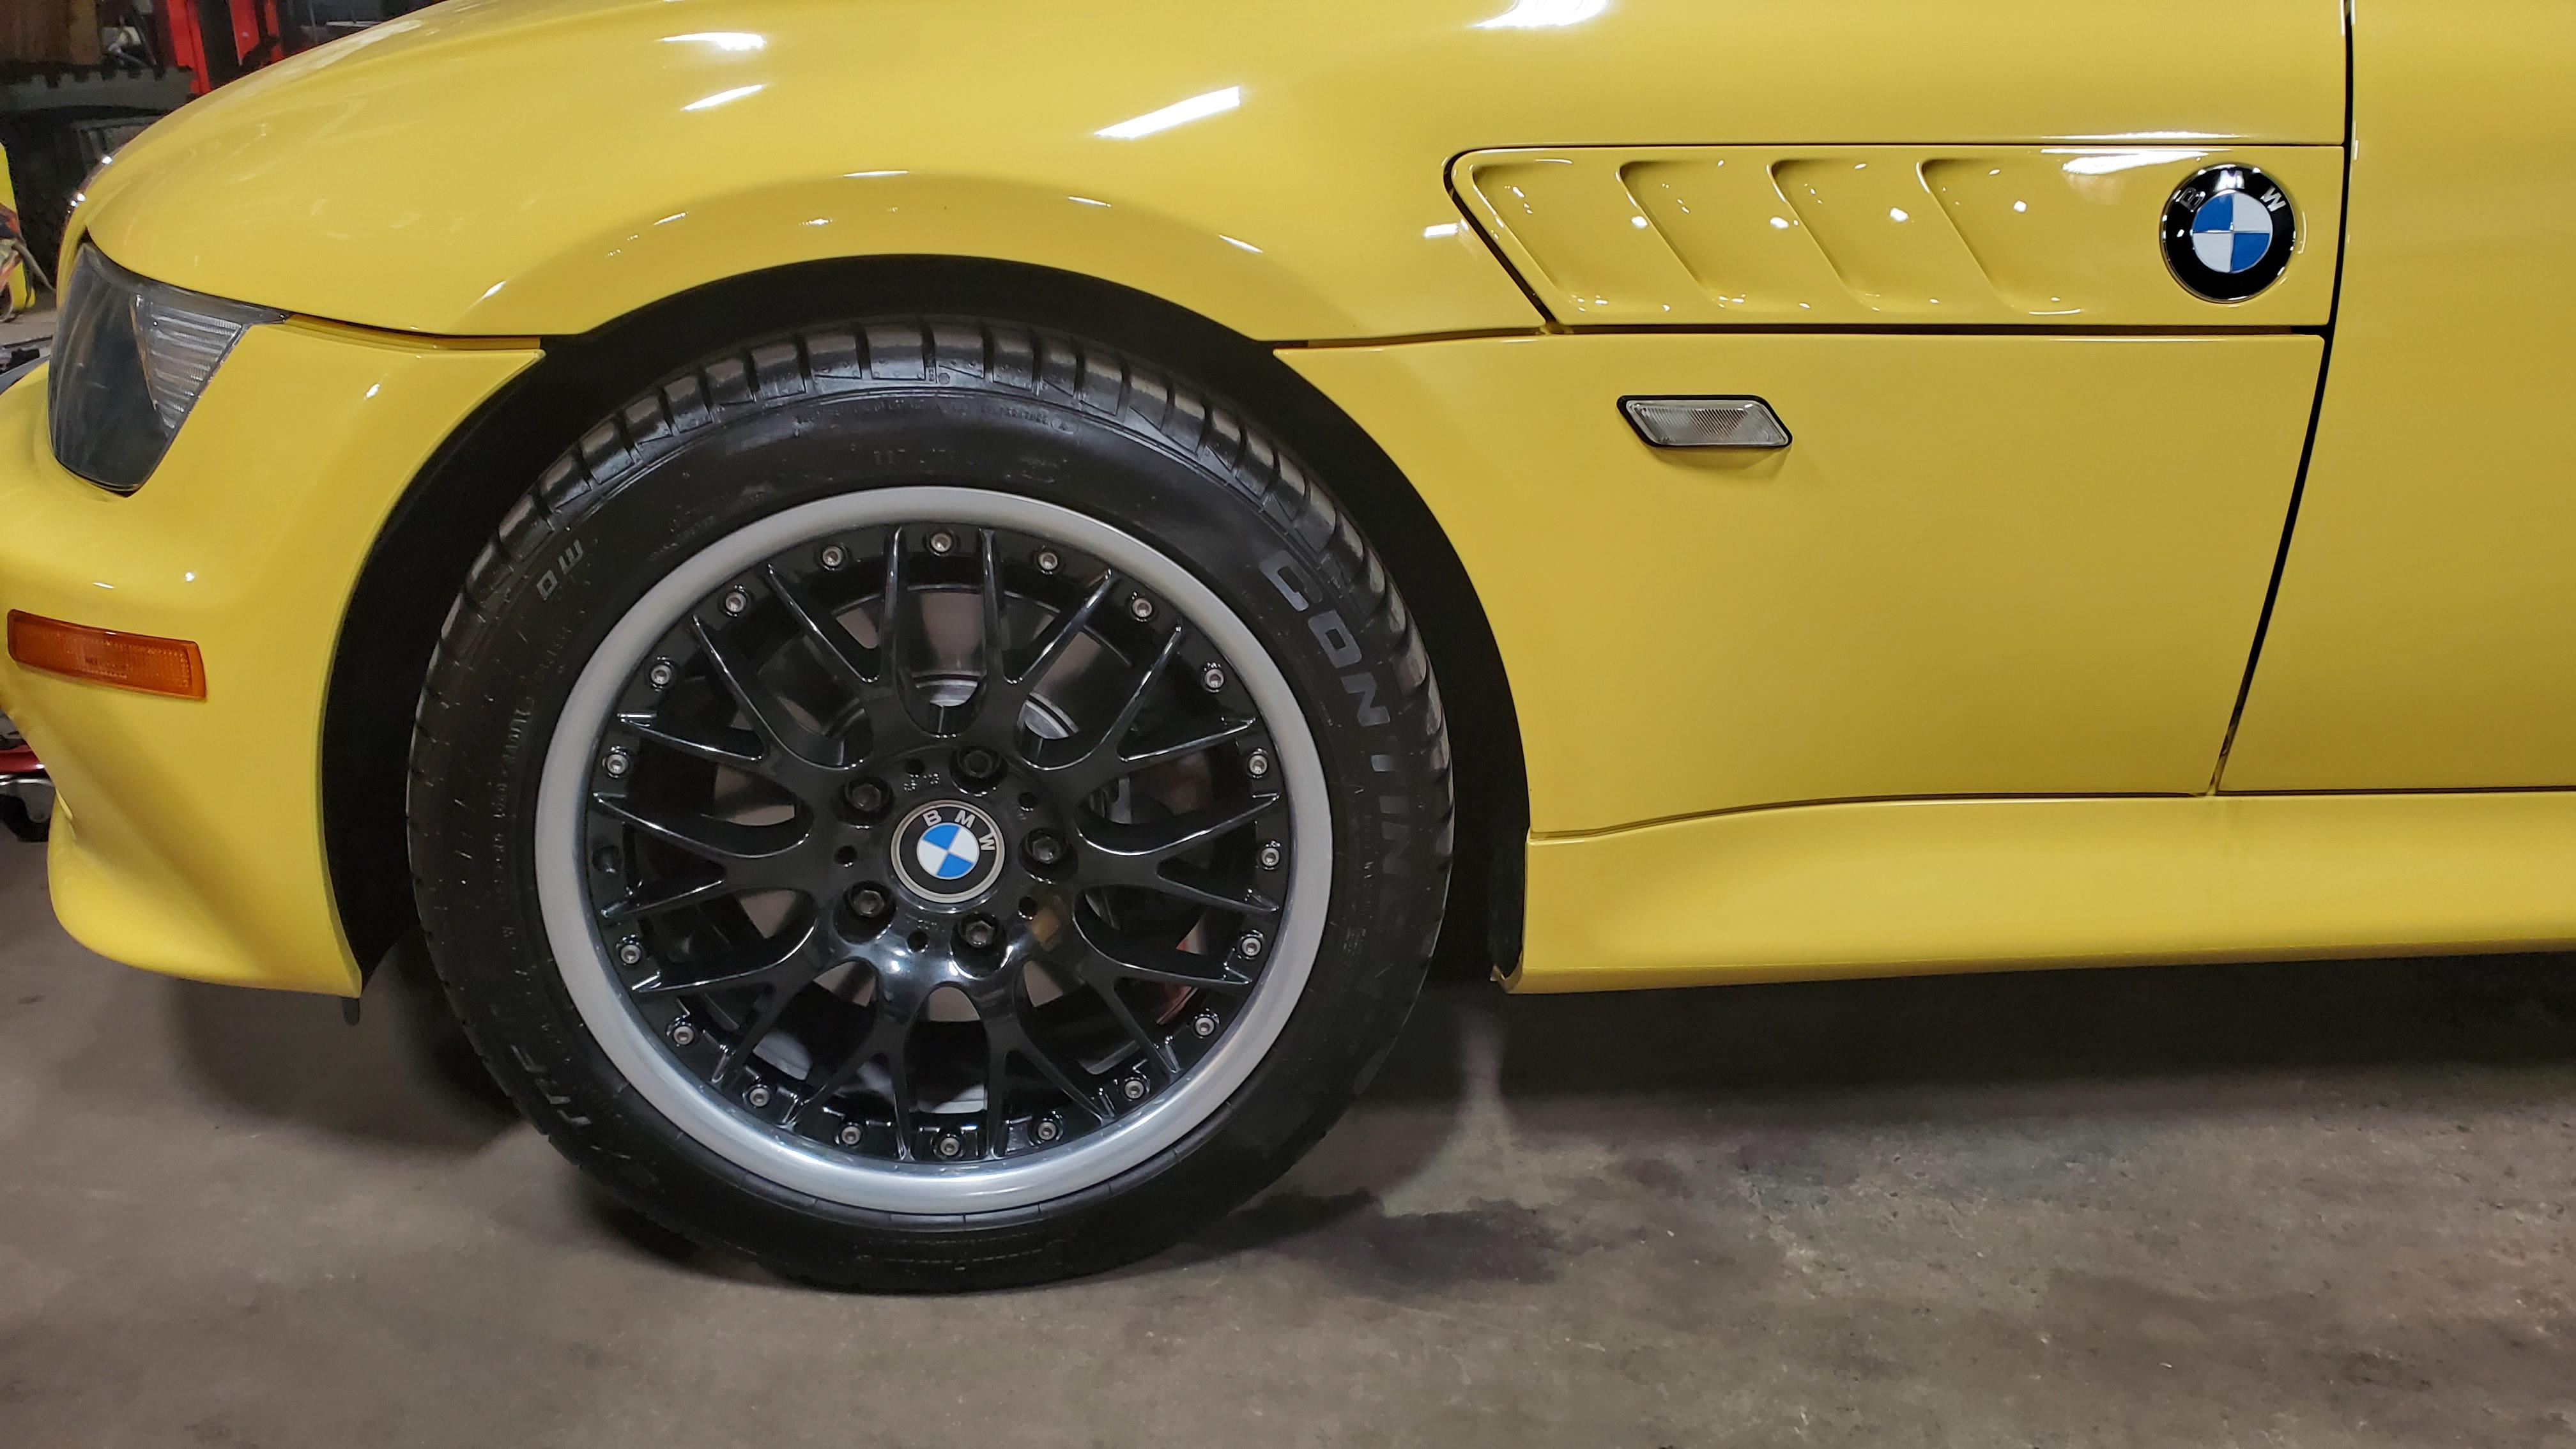 BMW Wheel Repair Gloss Black Rims